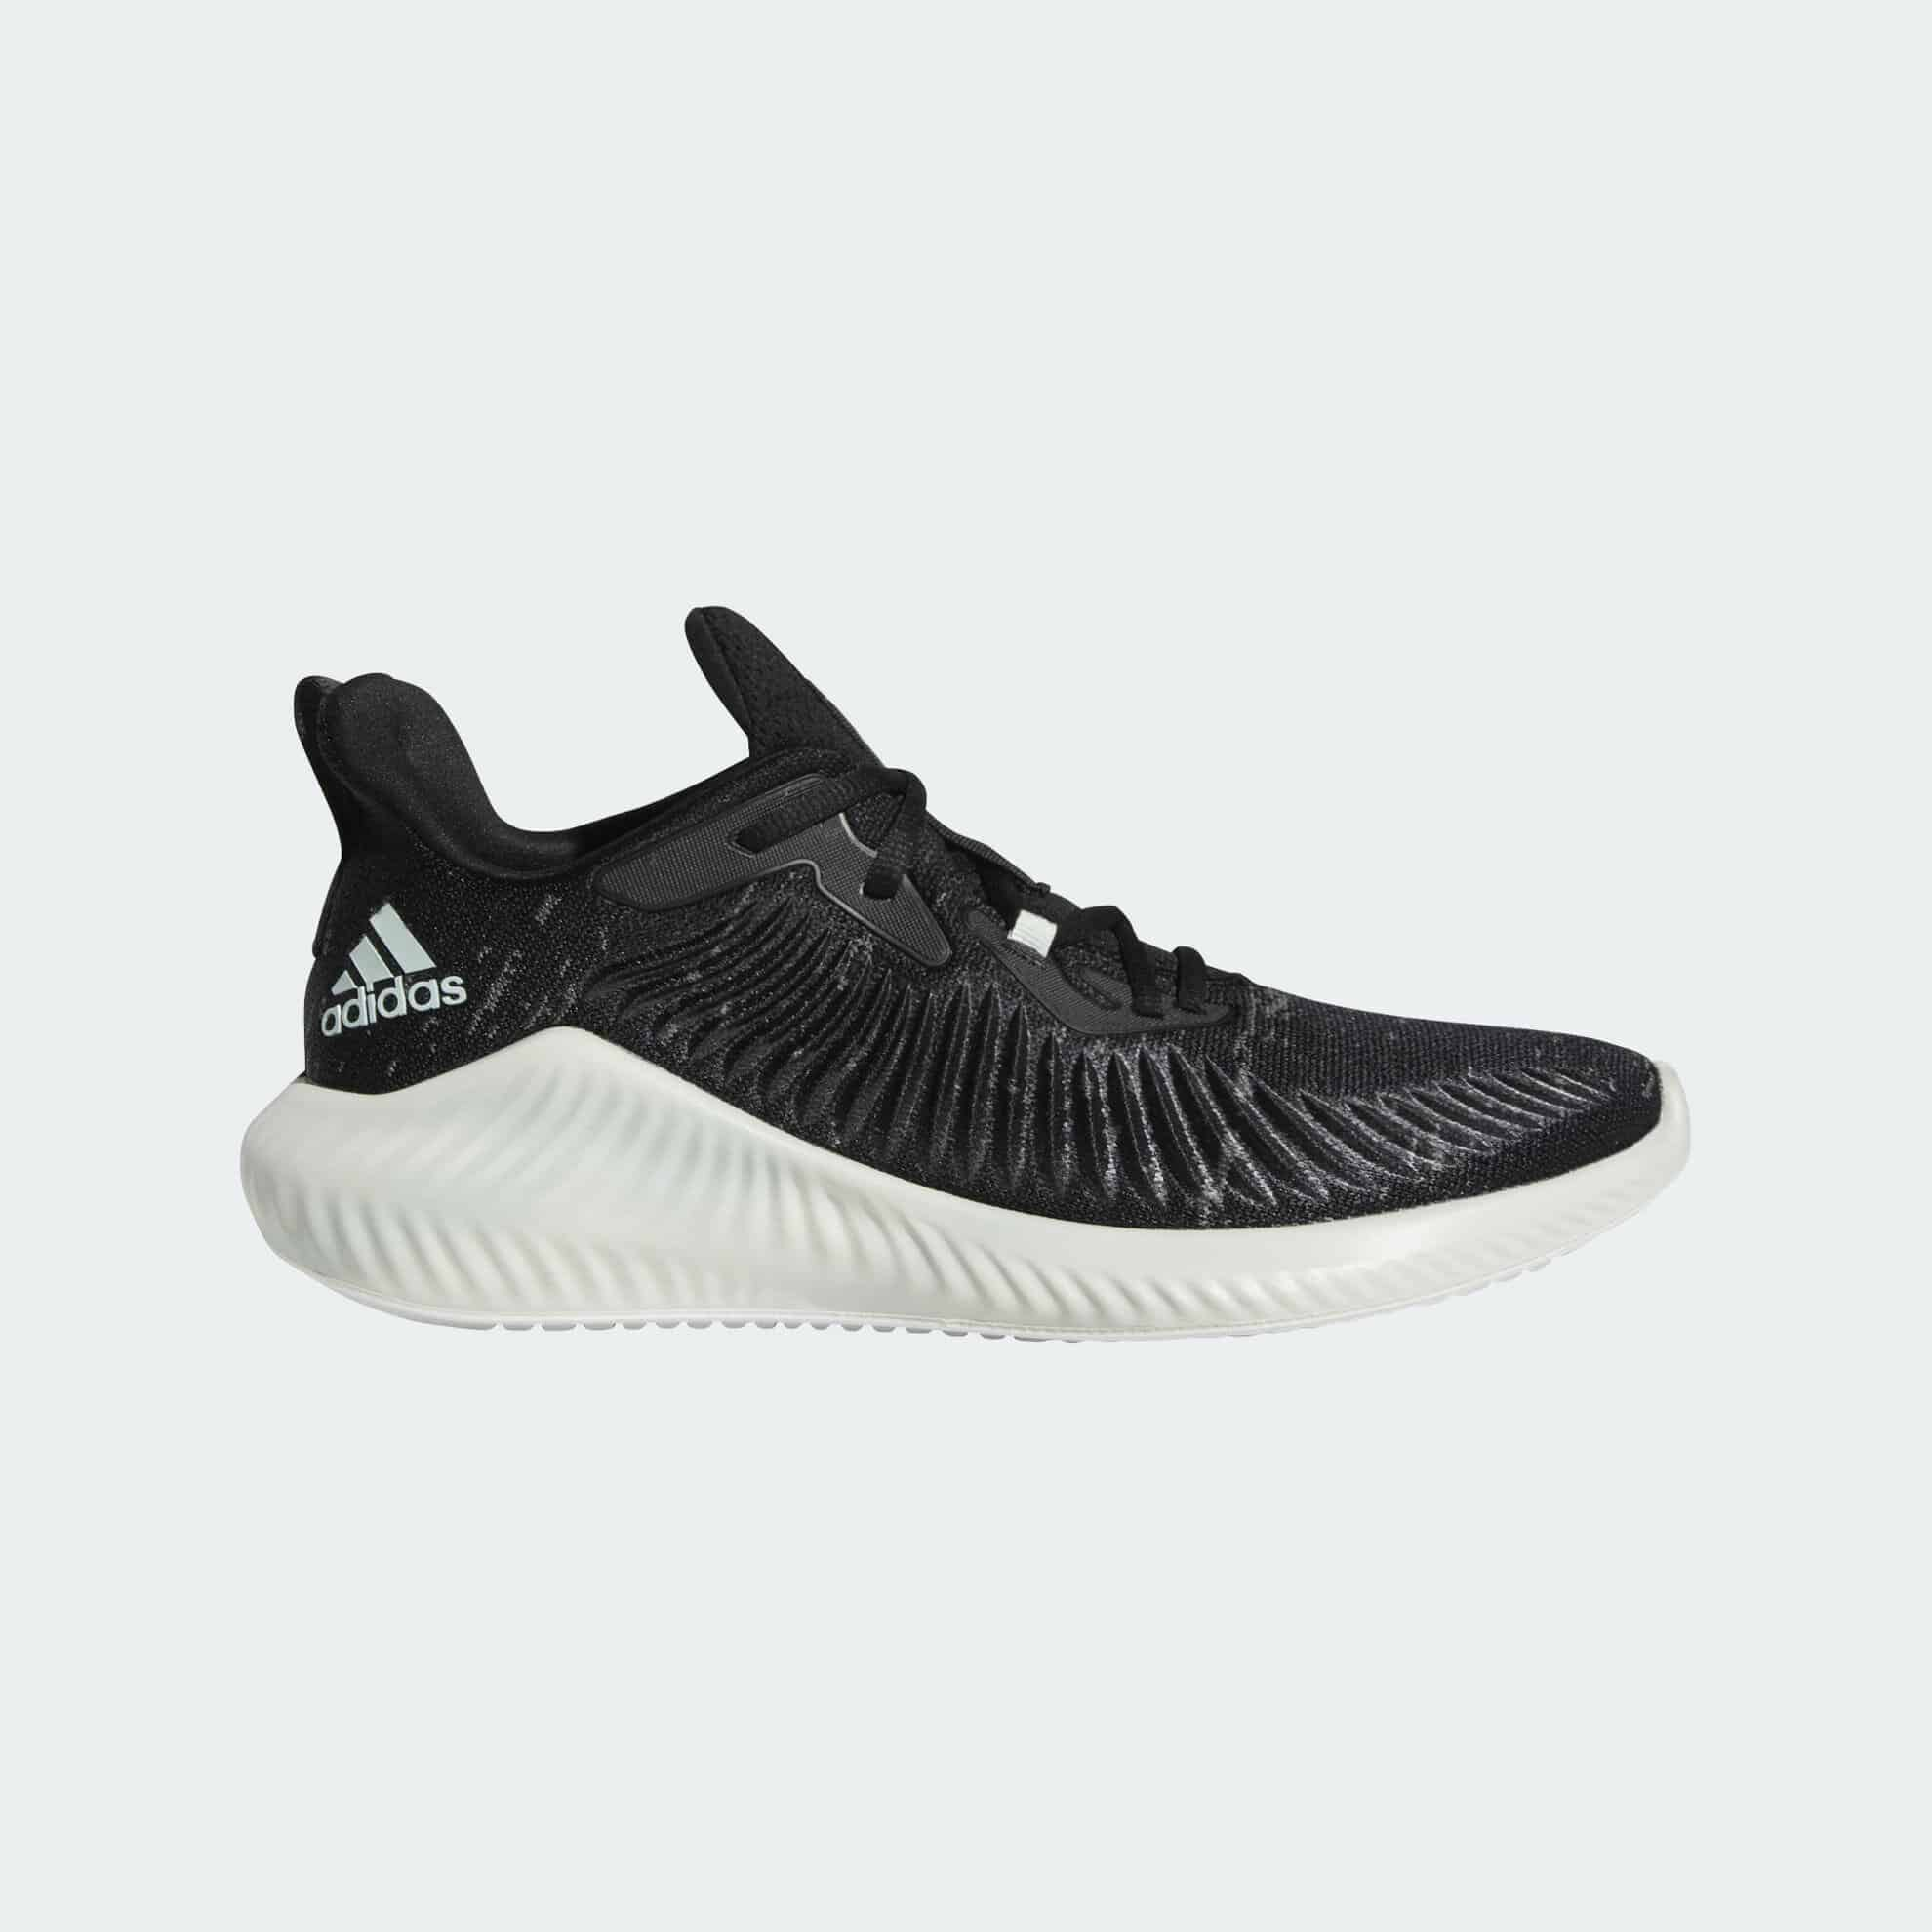 Adidas-Alphabounce-Run-Parley-Shoes